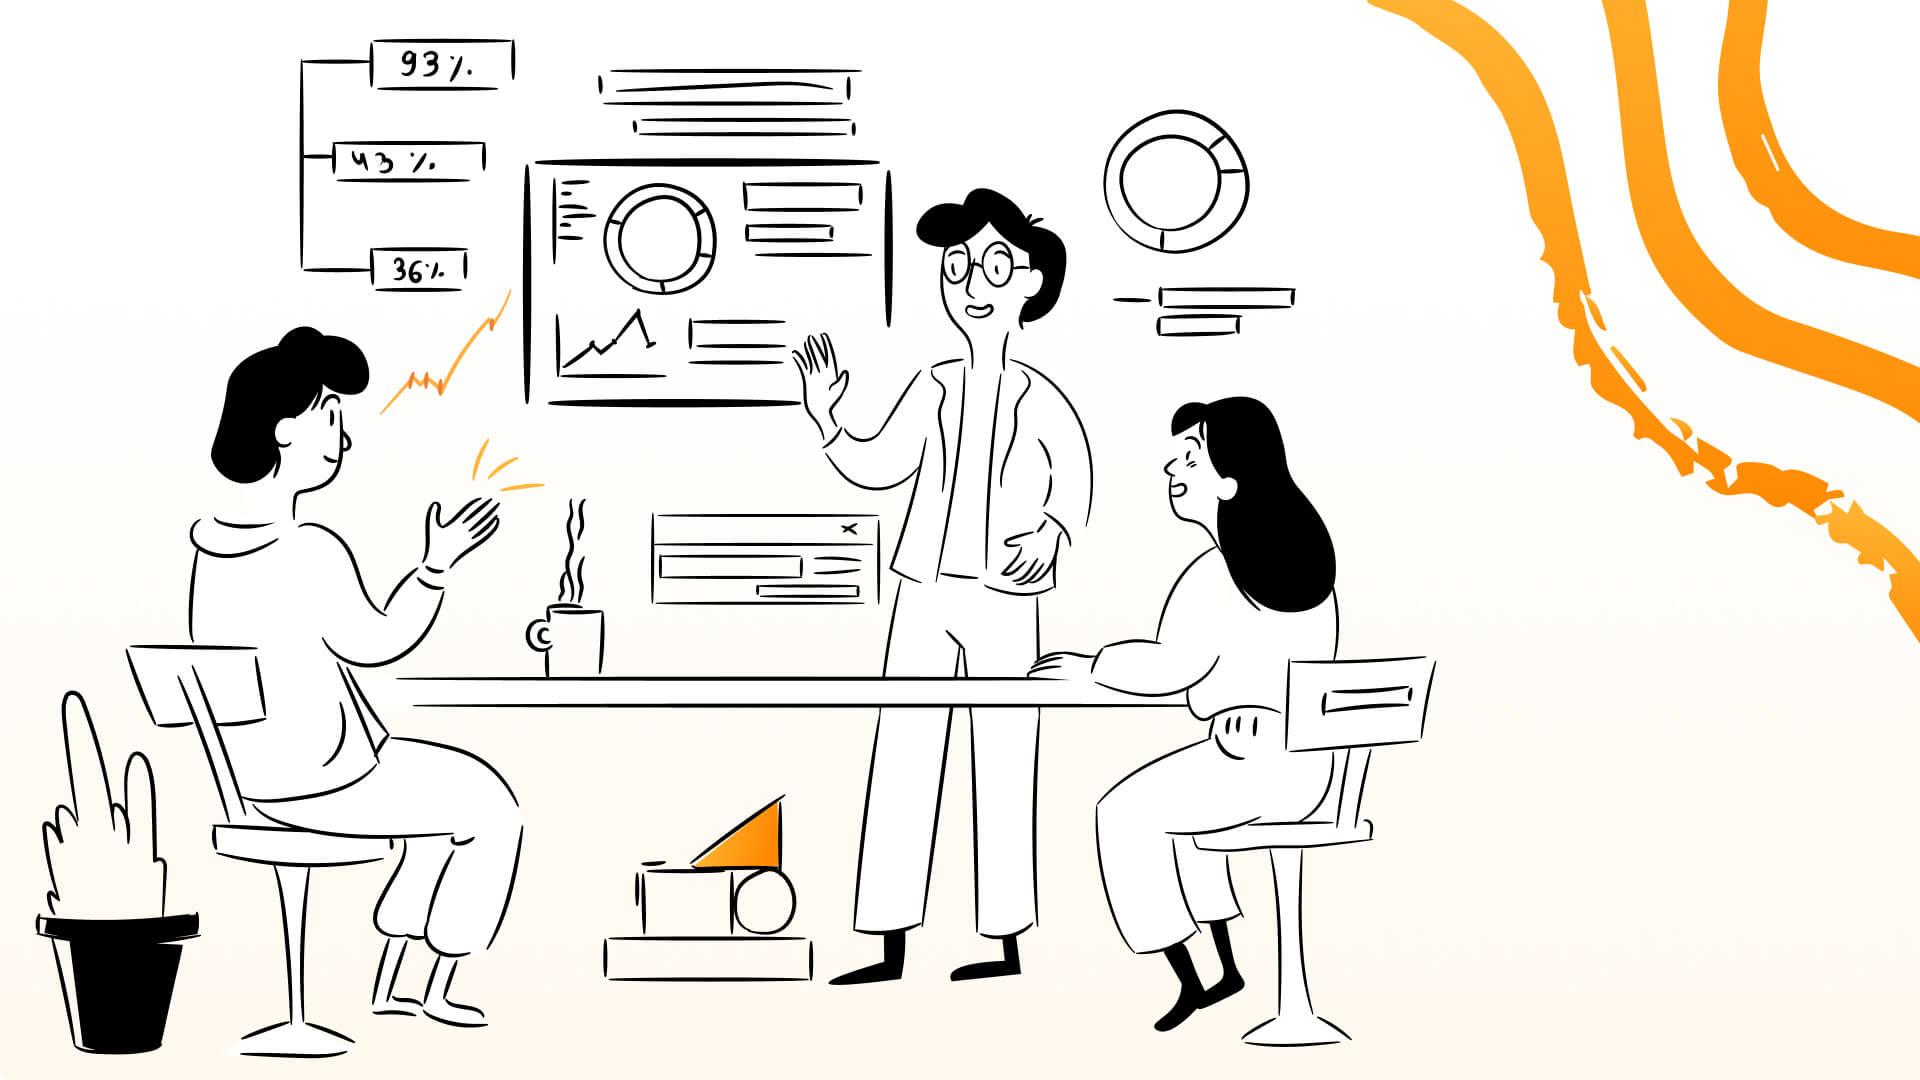 Mentorship increases employee engagement.